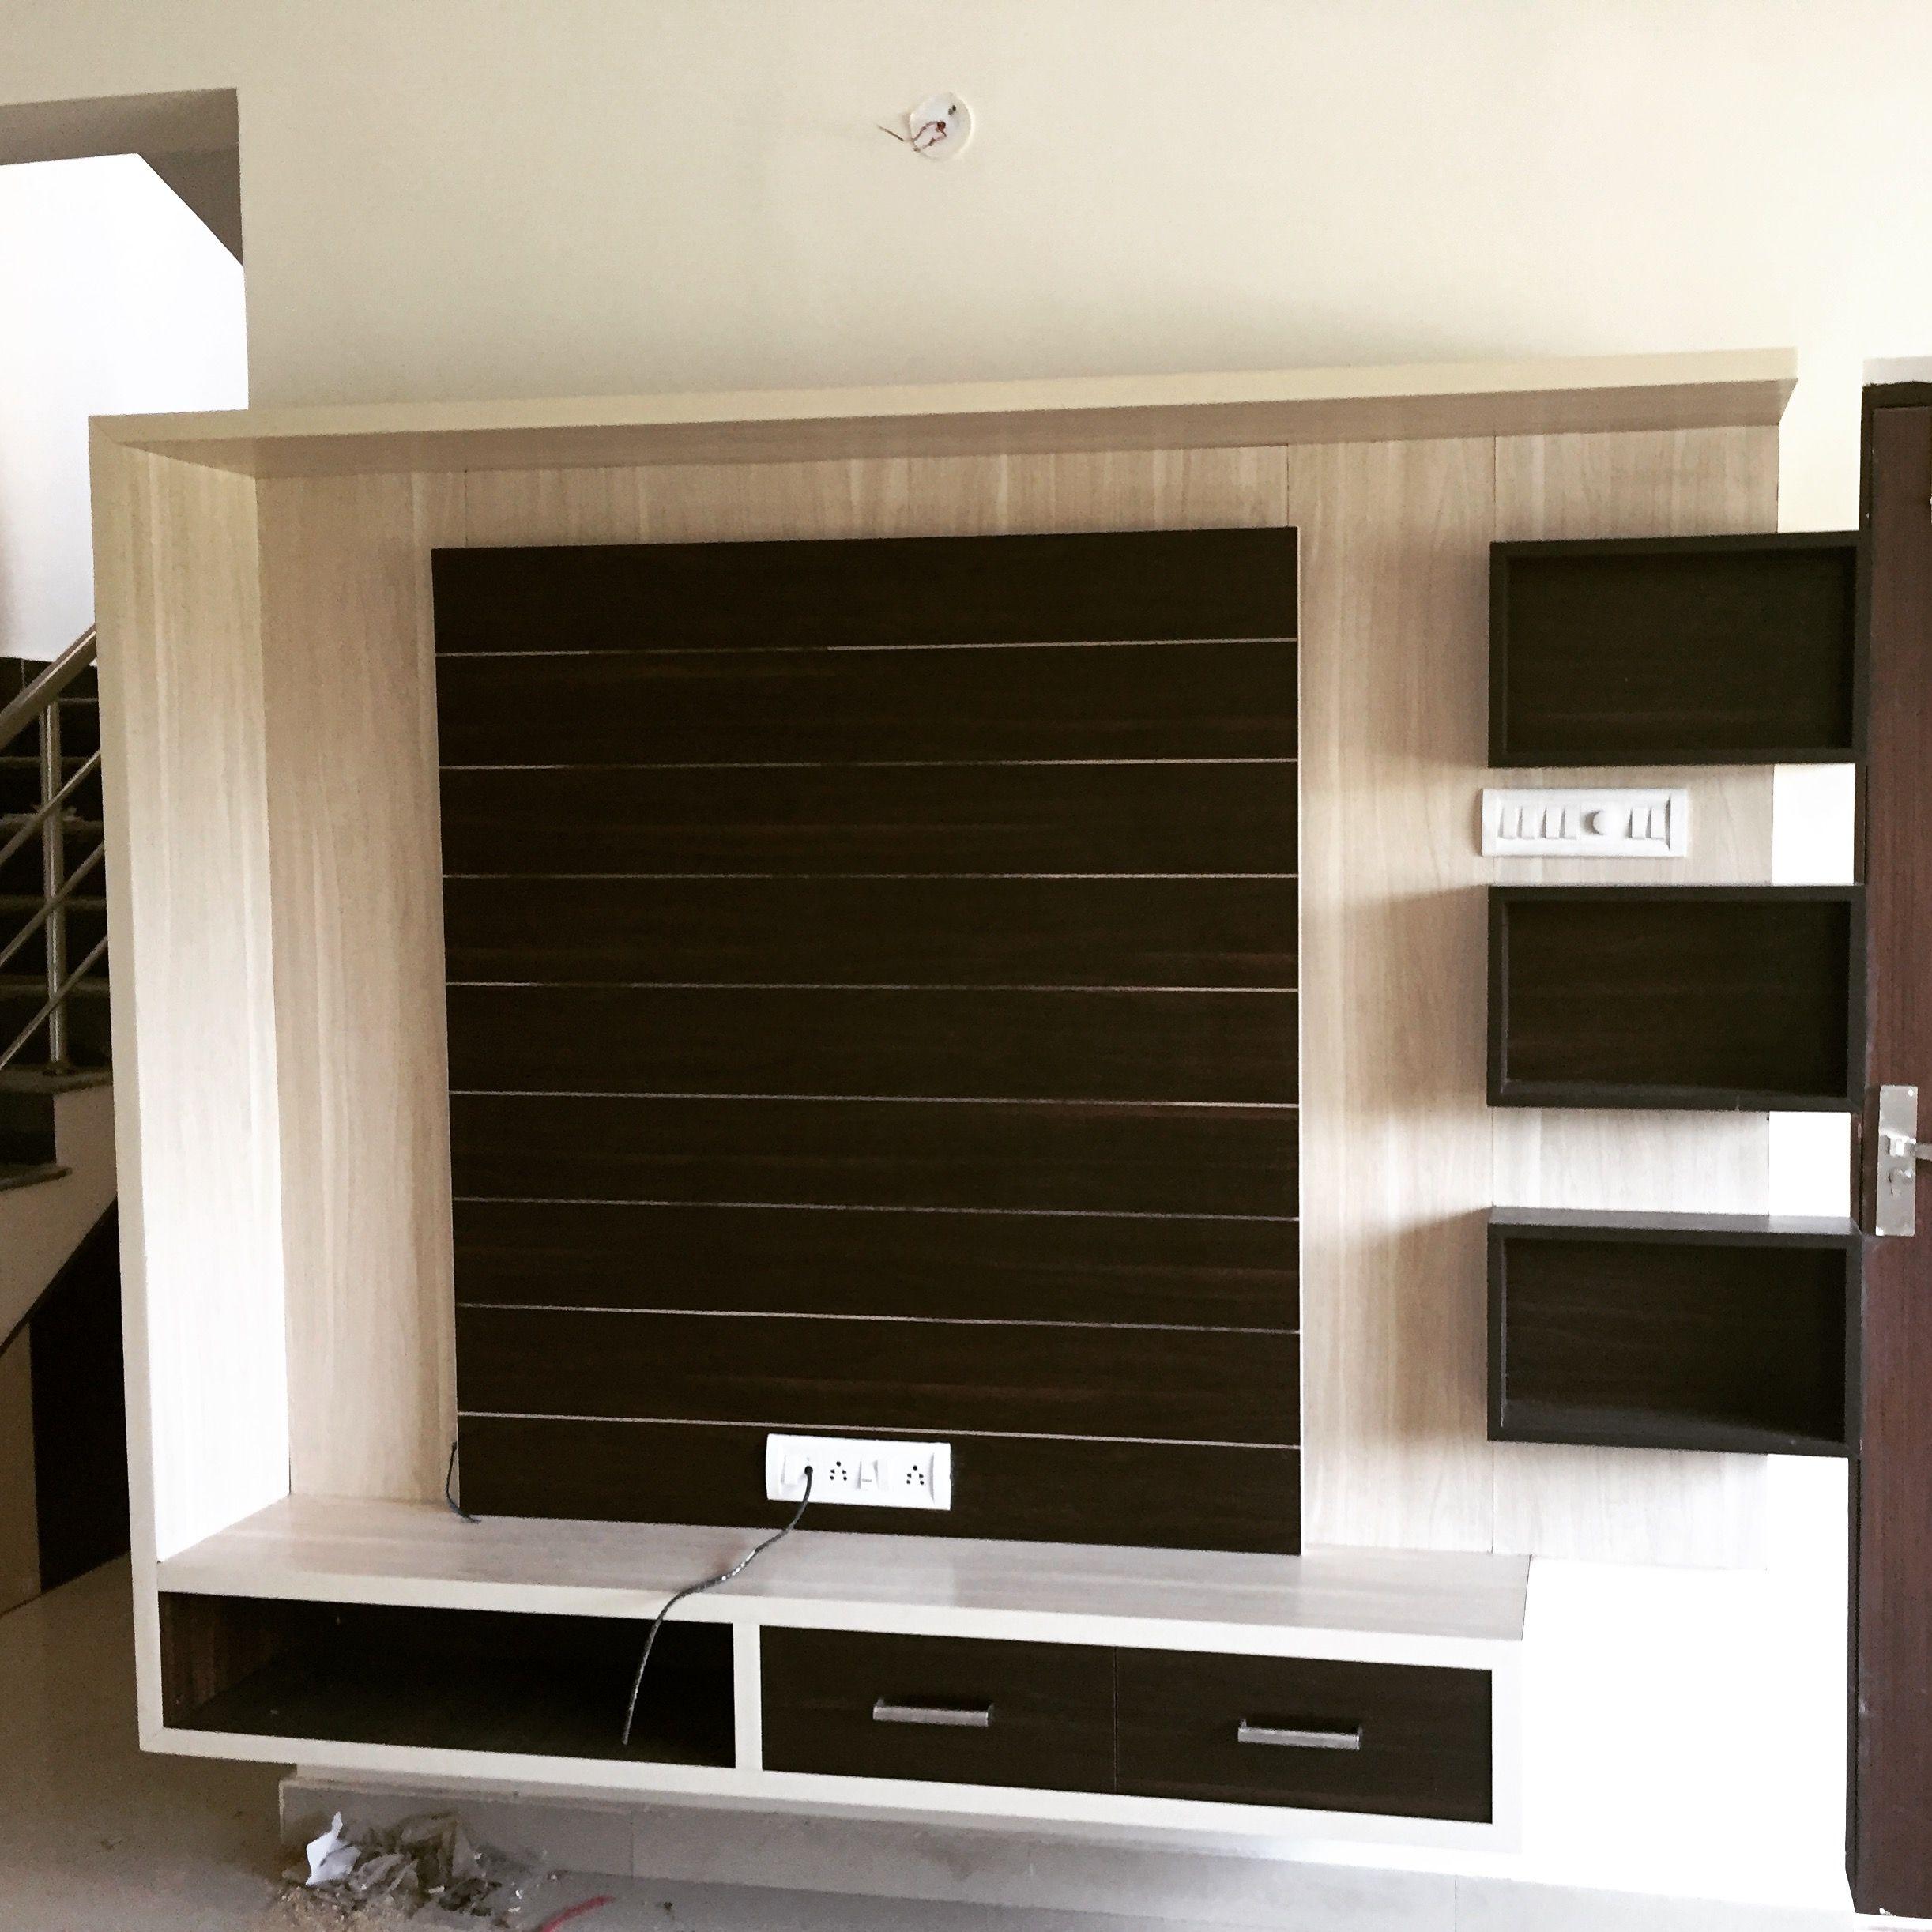 Pin By Sudha Rani On Door Handles Tv Unit Design Wall Tv Unit